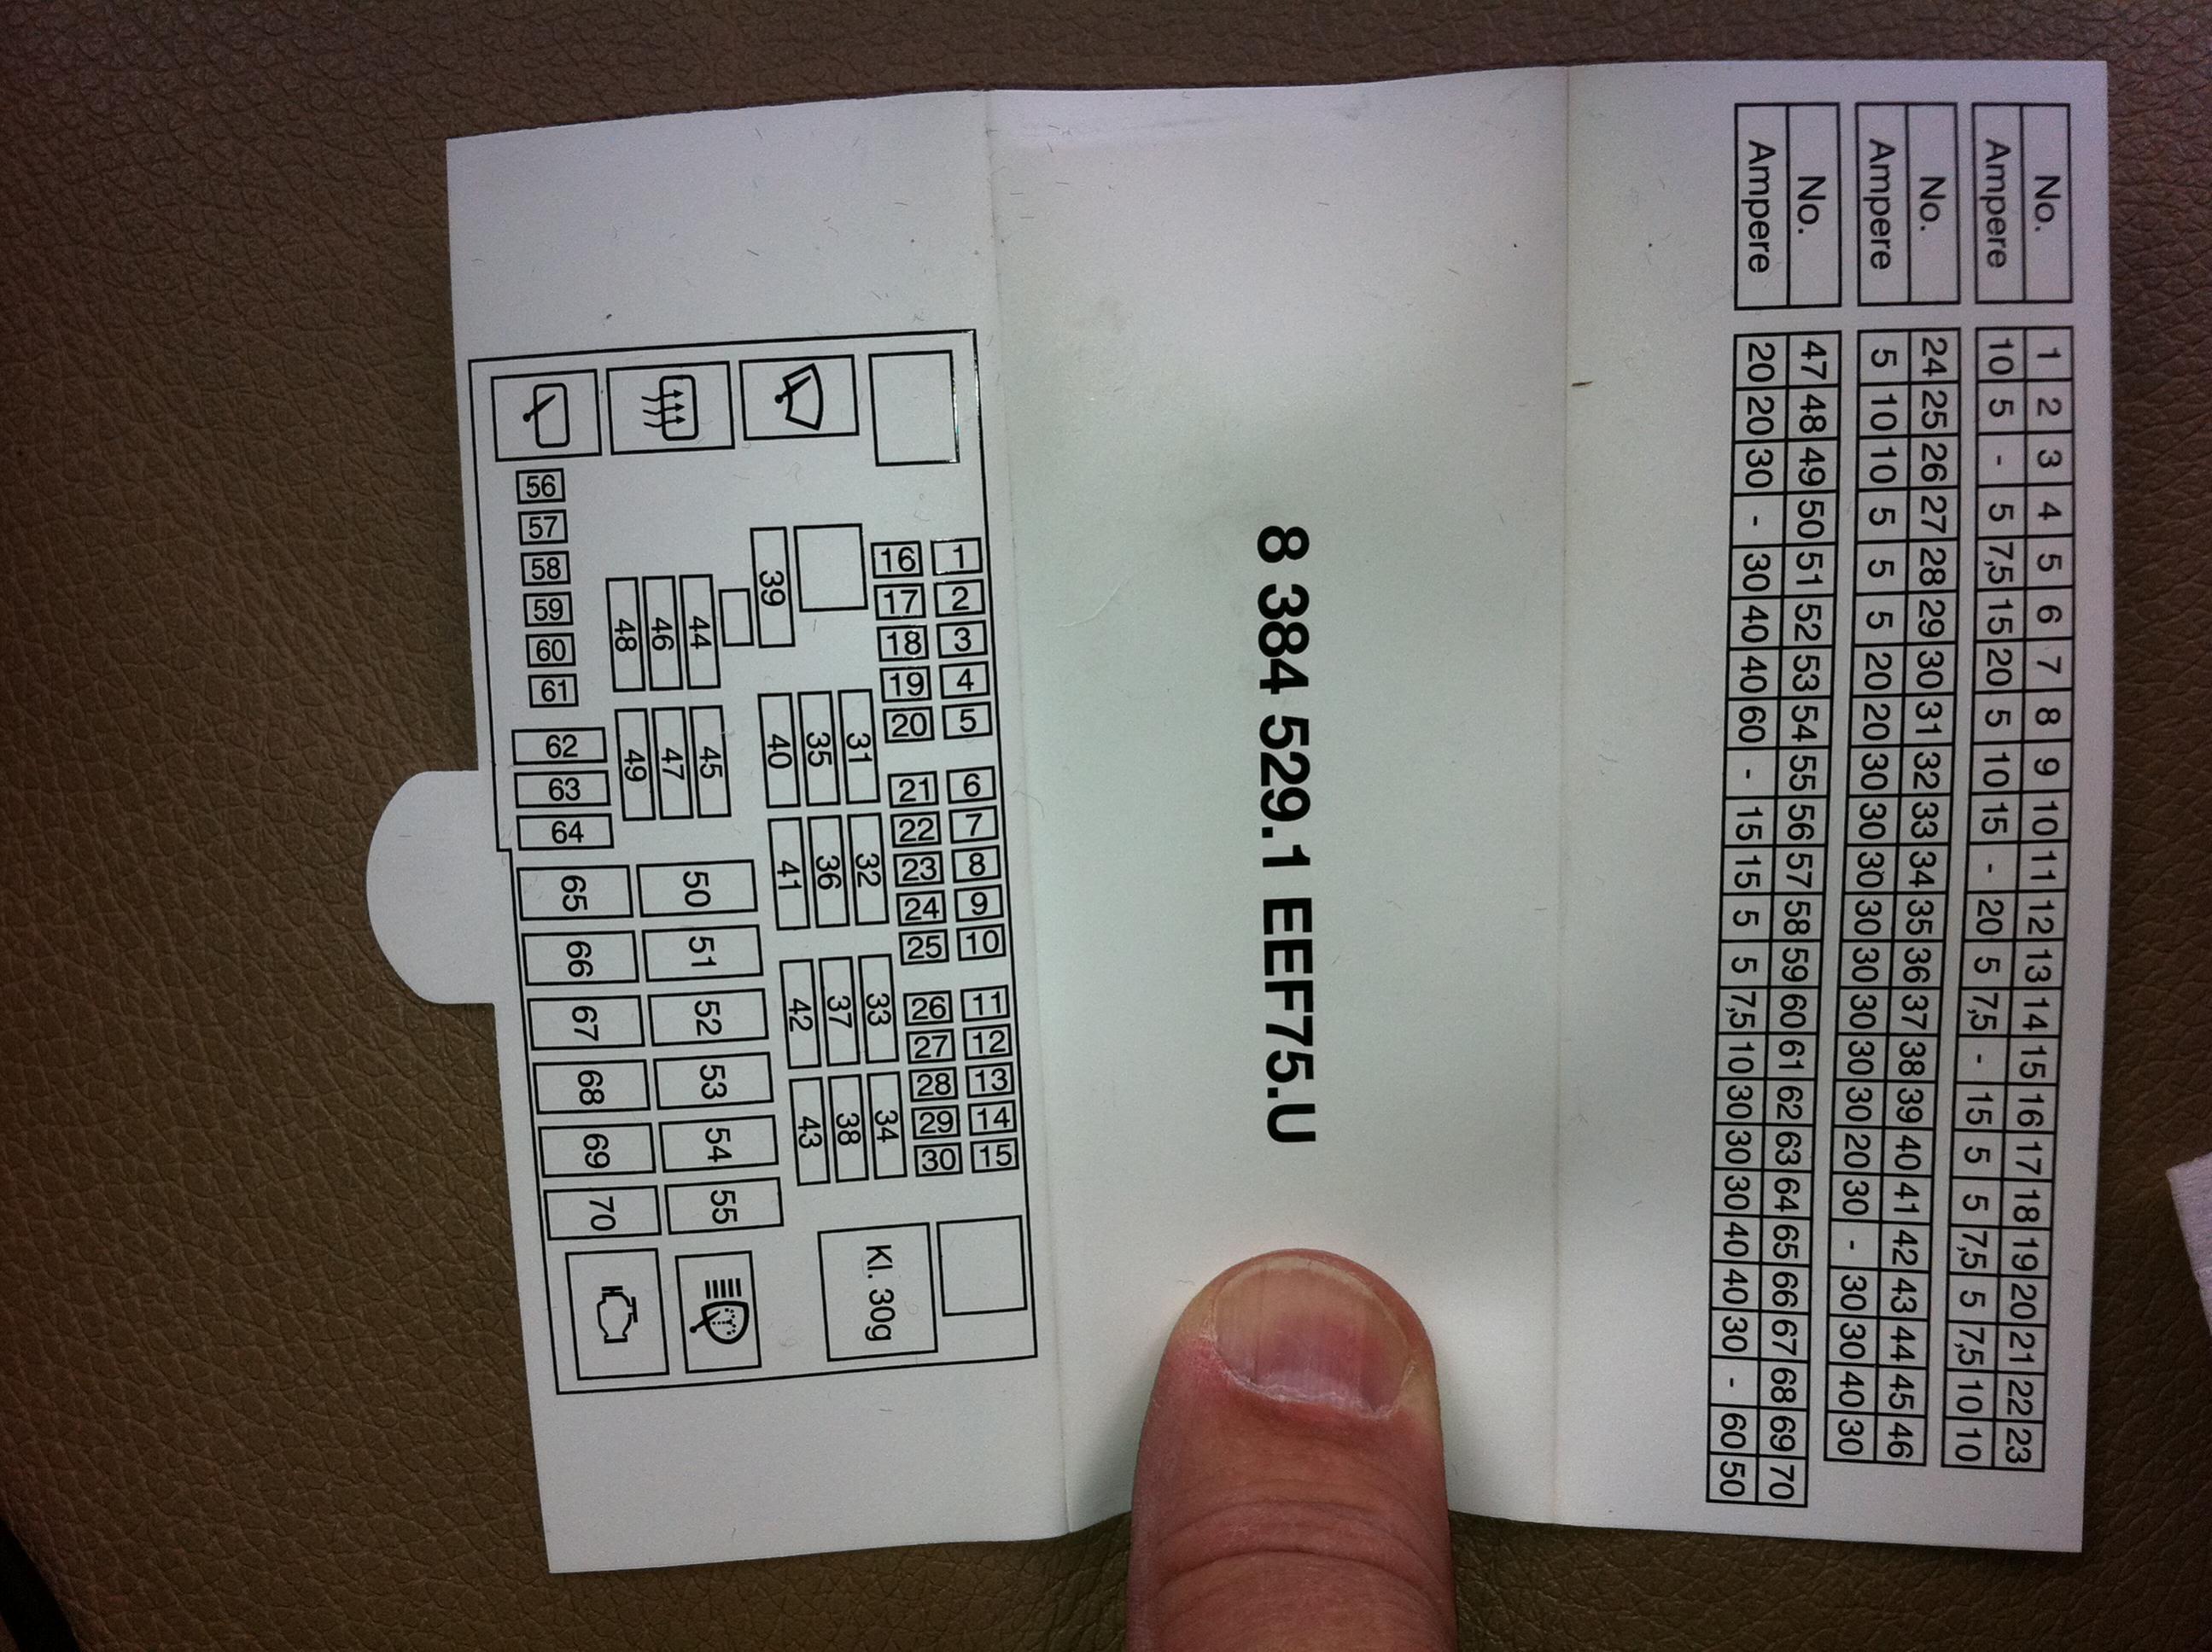 2004 Bmw 330xi Fuse Box Diagram Bege Wiring Diagram